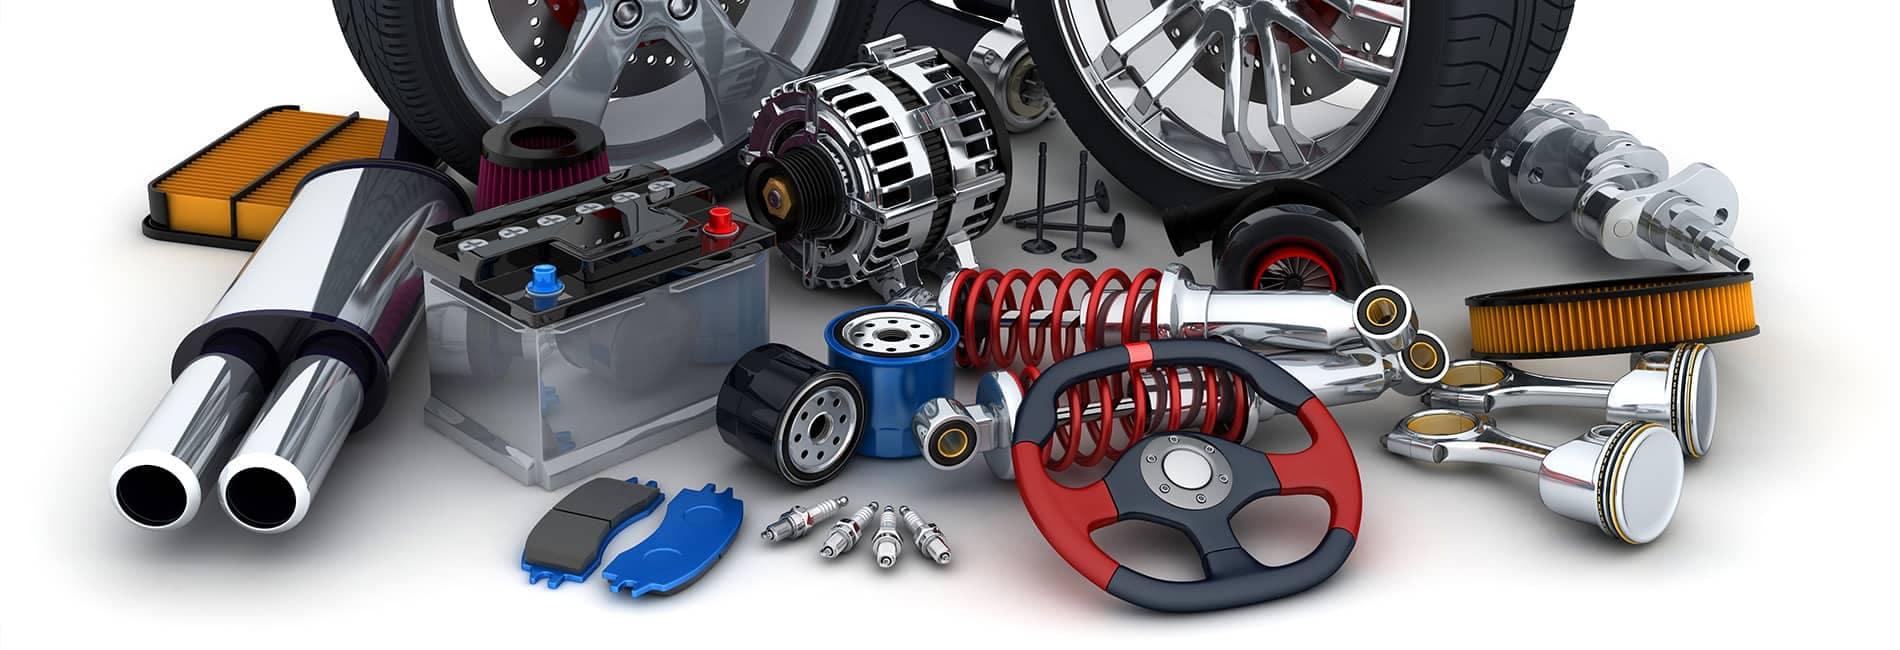 car parts set on a table